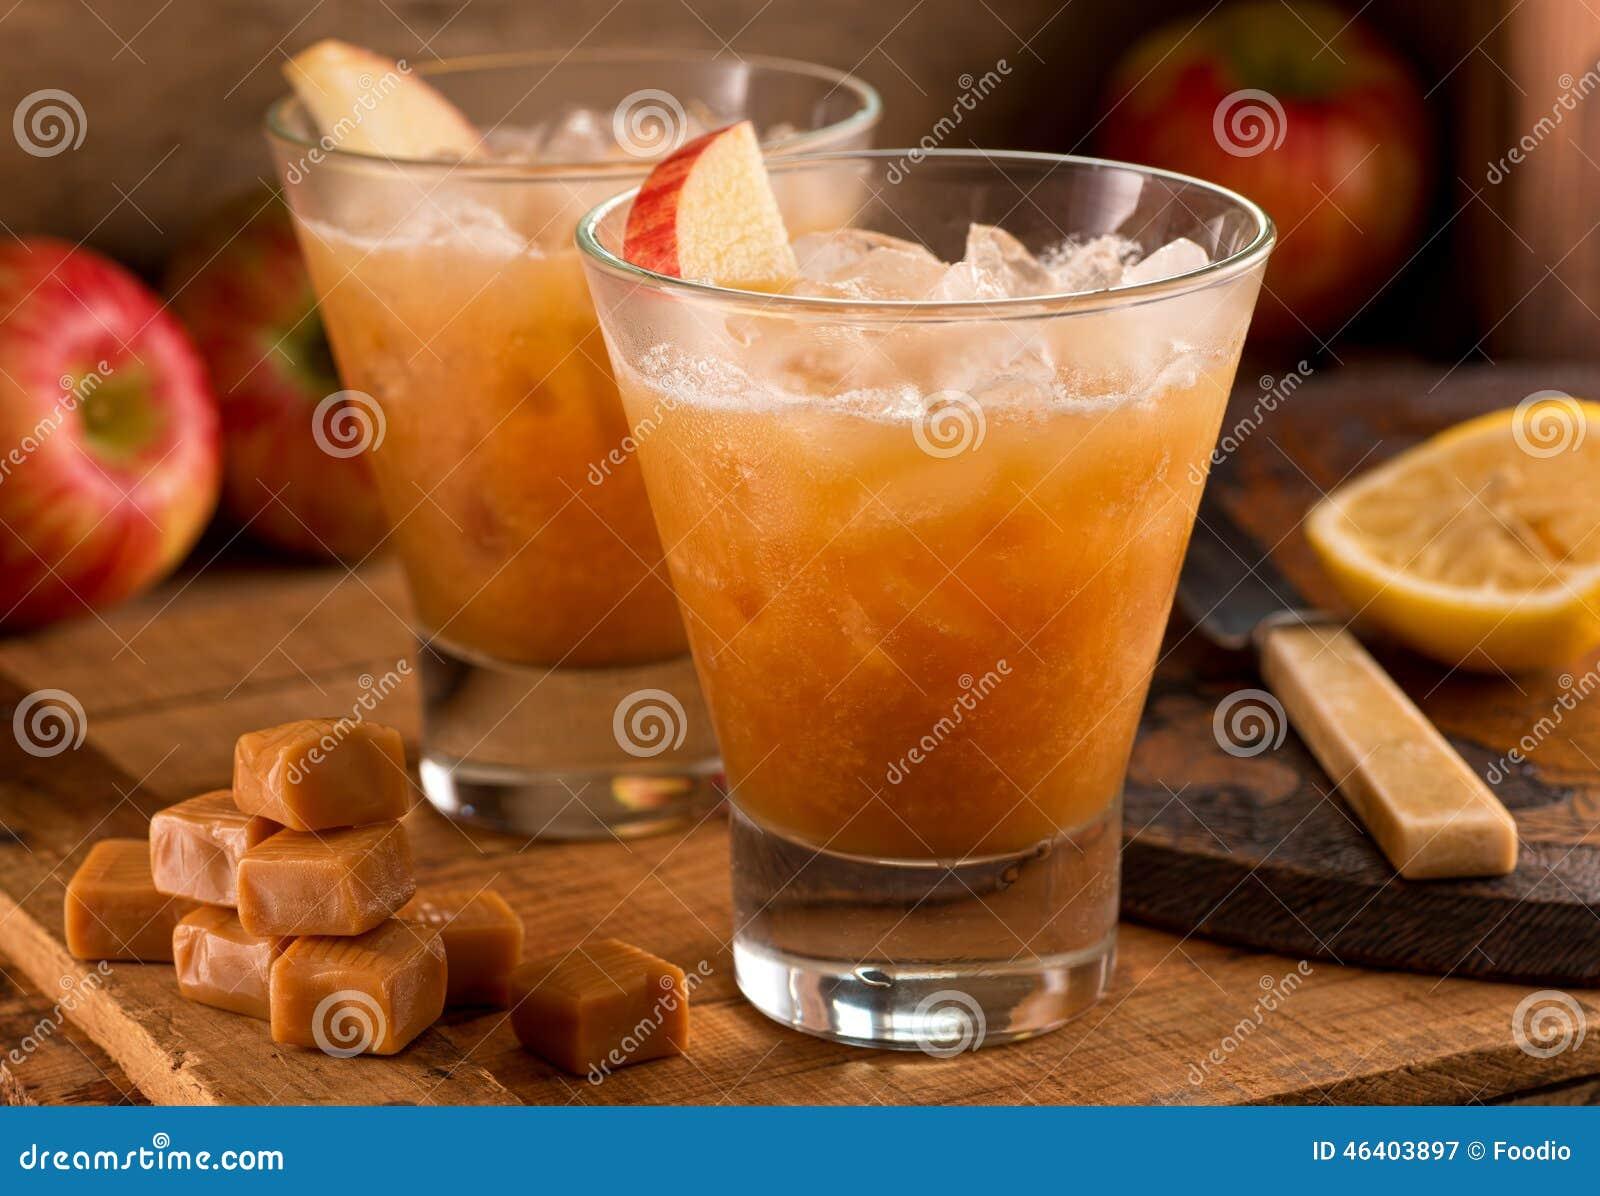 cocktail de cidre d 39 apple de caramel photo stock image 46403897. Black Bedroom Furniture Sets. Home Design Ideas